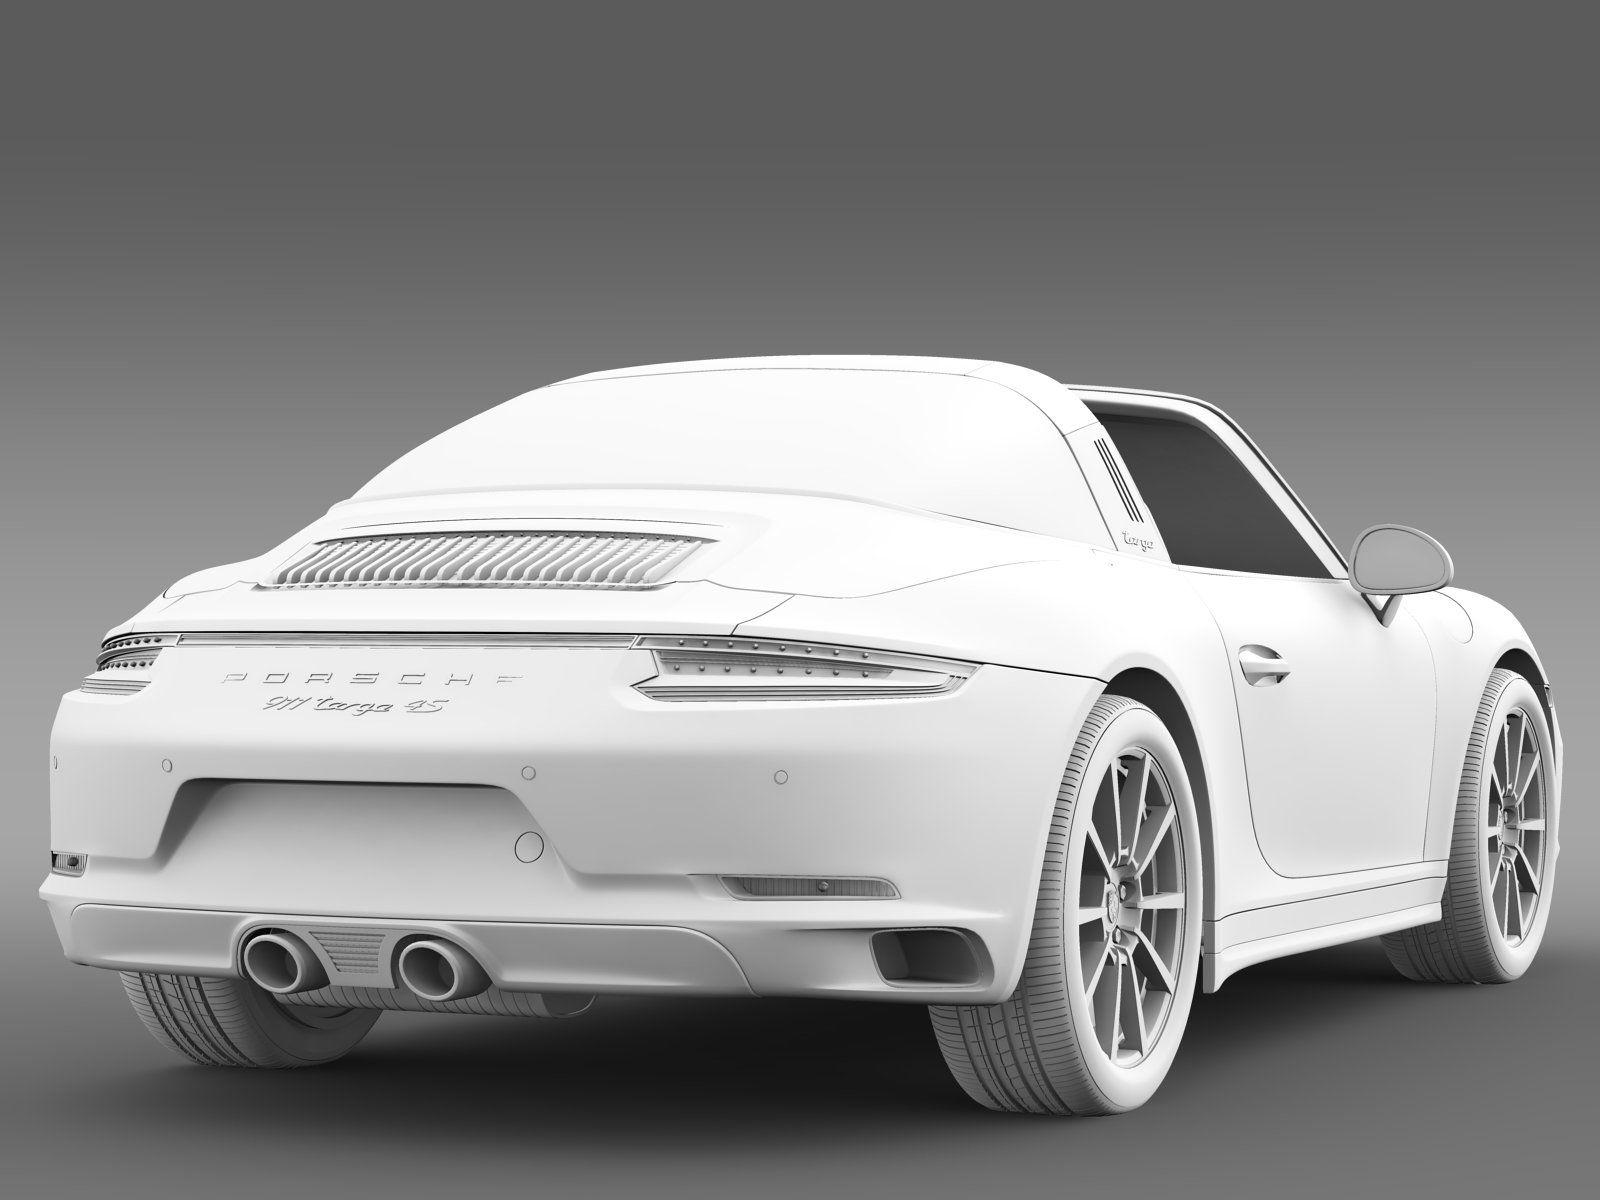 Porsche 911 Targa 4s 991 2016 Porsche 911 Targa Porsche 911 Targa 4s Porsche 911 Carrera 4s